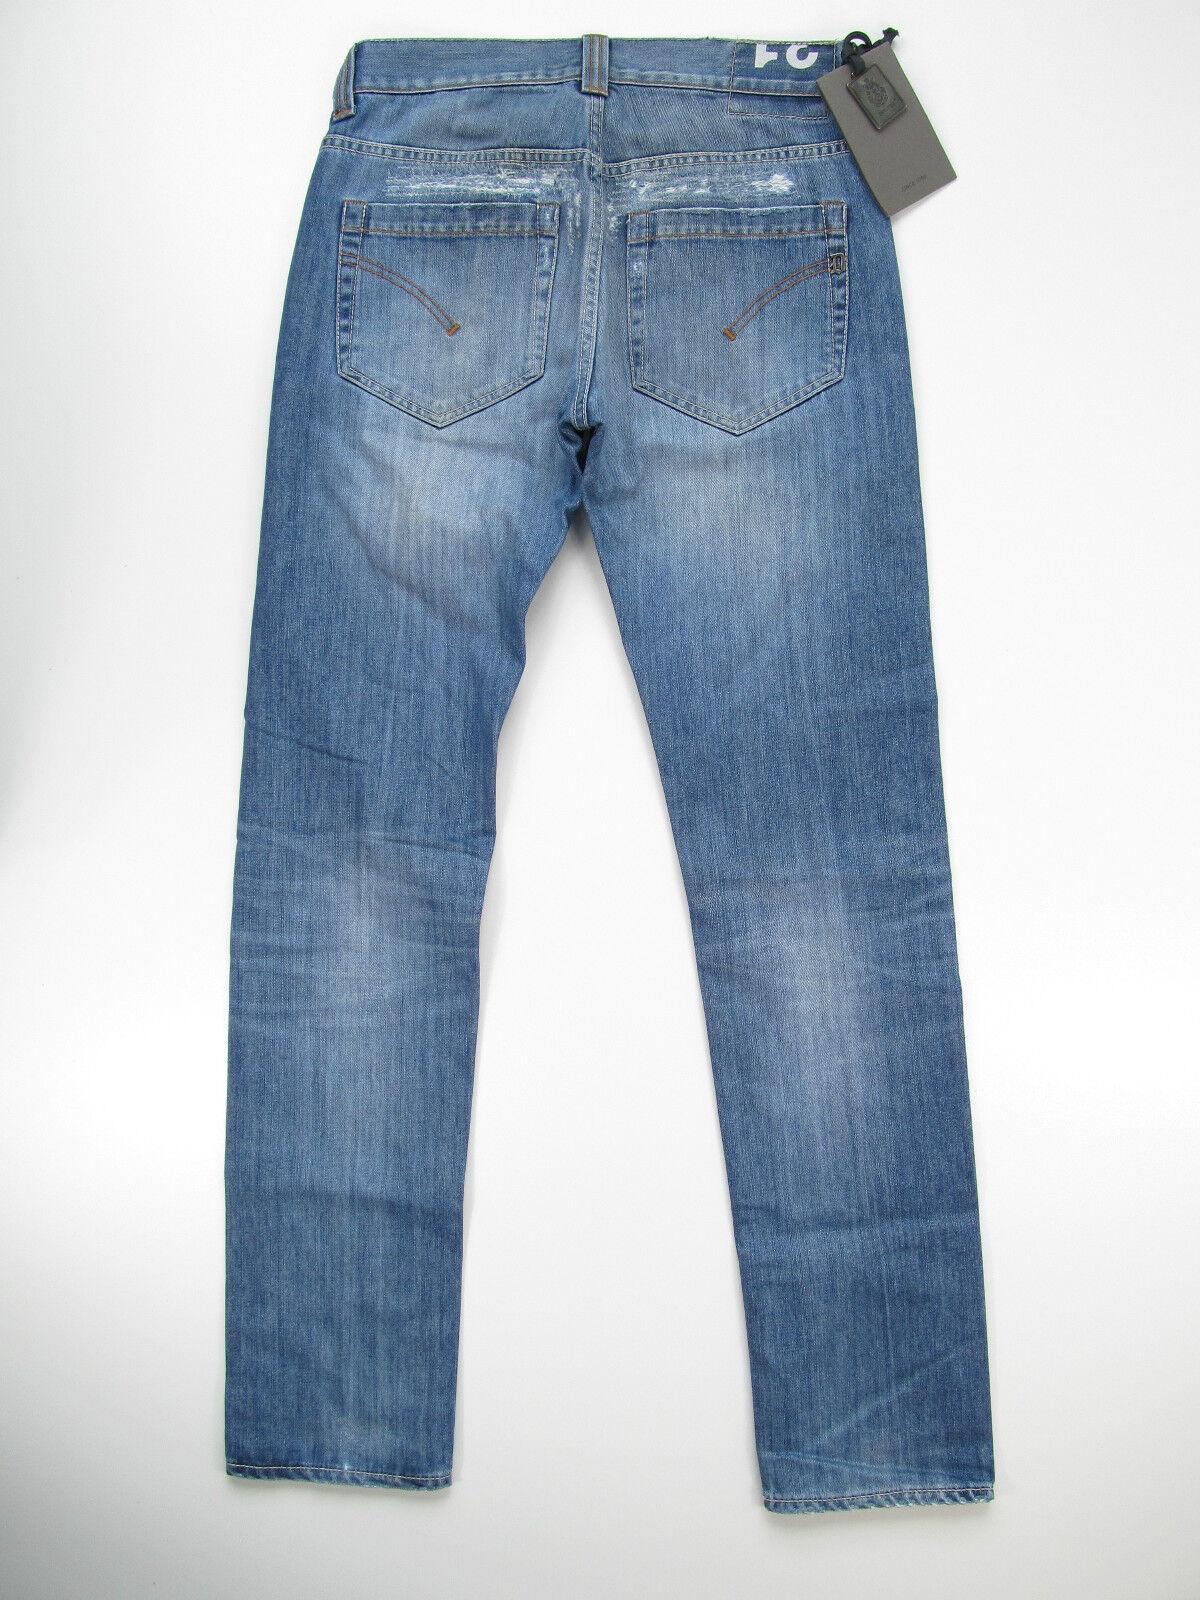 Dondup Hose Denim Jeans Hose UP223 DF023U 800 800 800 Emil Pantalone HellBlau Neu 9e9aa9